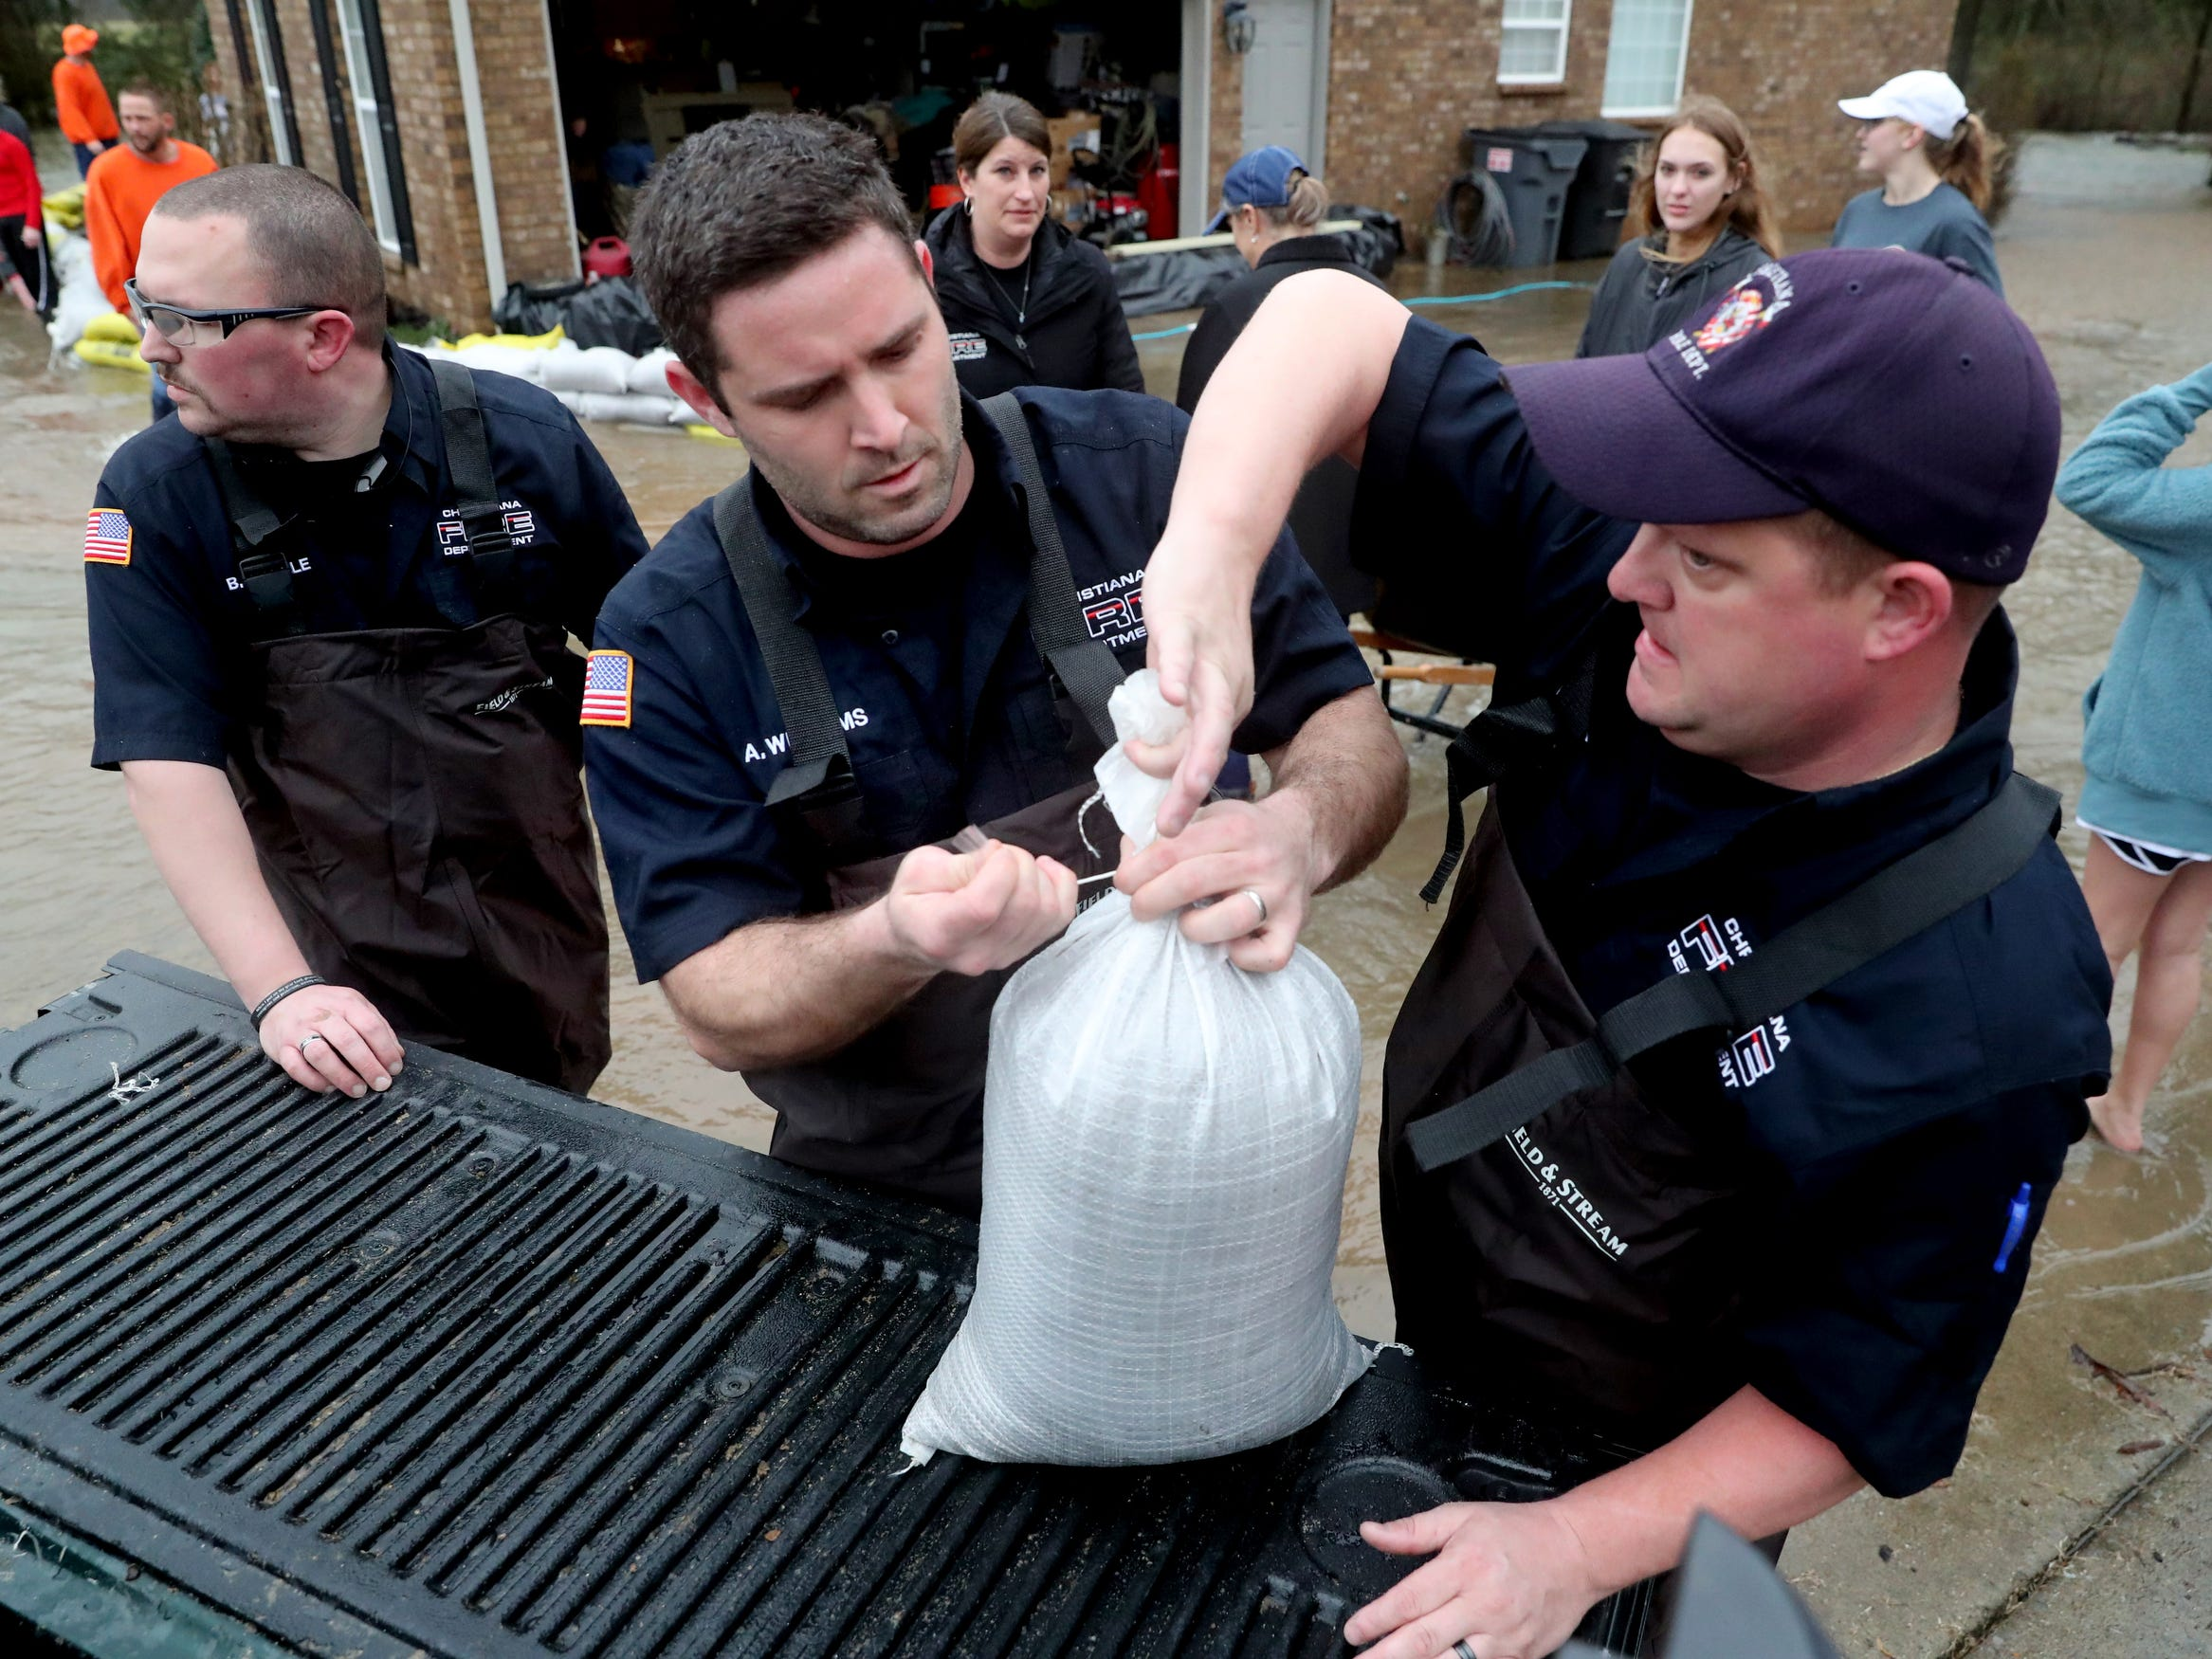 Christiana Fire Department members Mike Tappe (right), Allen Williams (middle), William Steele (left) prepare sand bags in Murfreesboro on Saturday, Feb. 23, 2019.